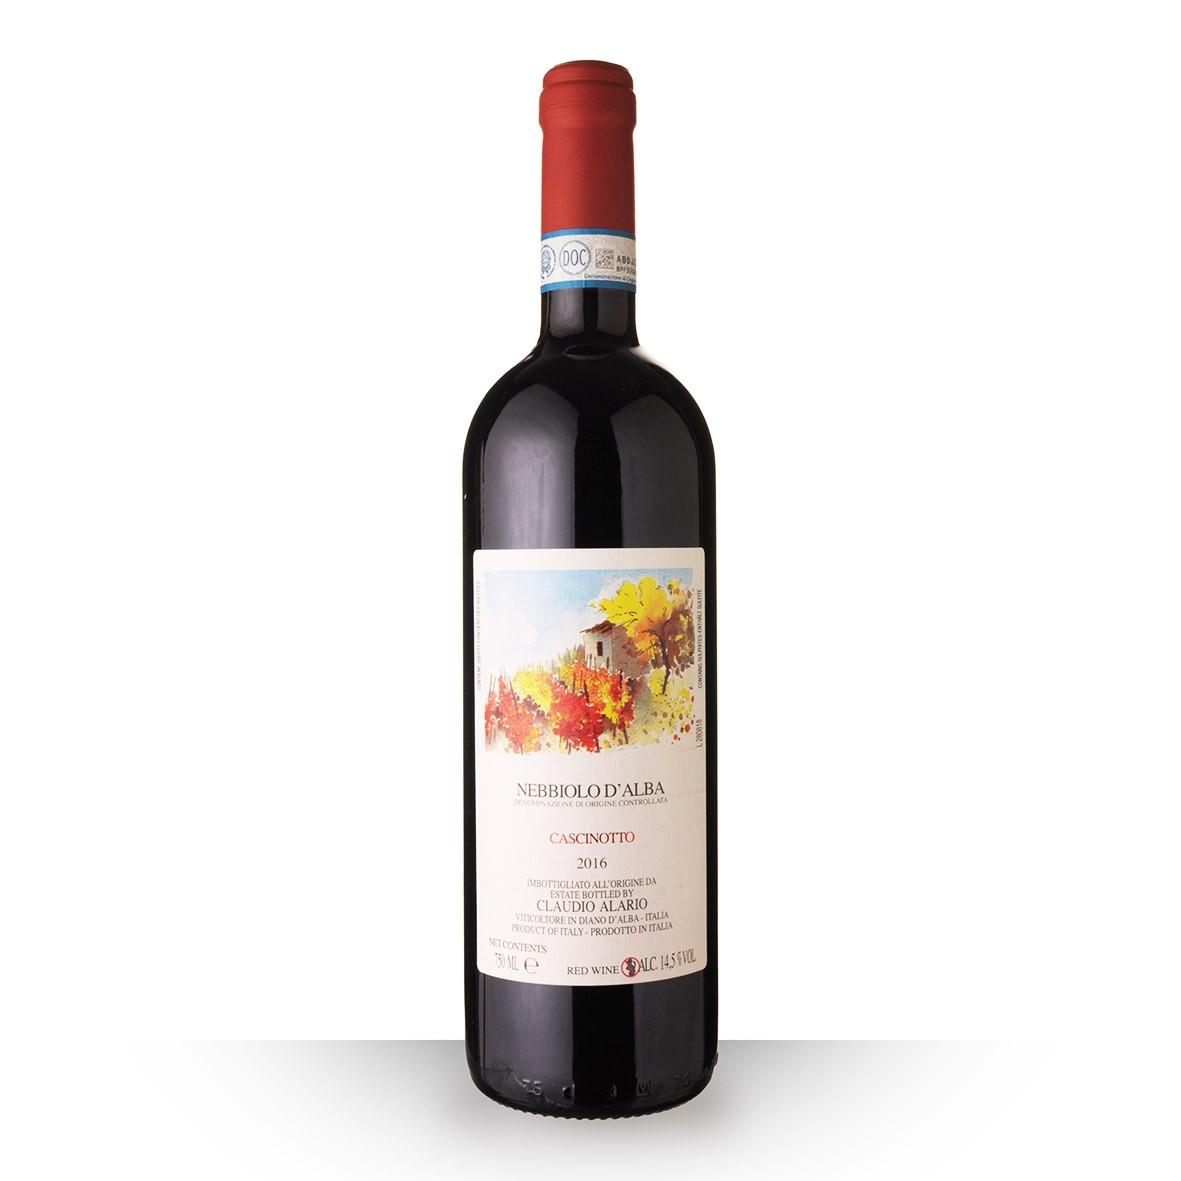 Alario Claudio Cascinotto Nebbiolo dAlba Rouge 2016 75cl www.odyssee-vins.com